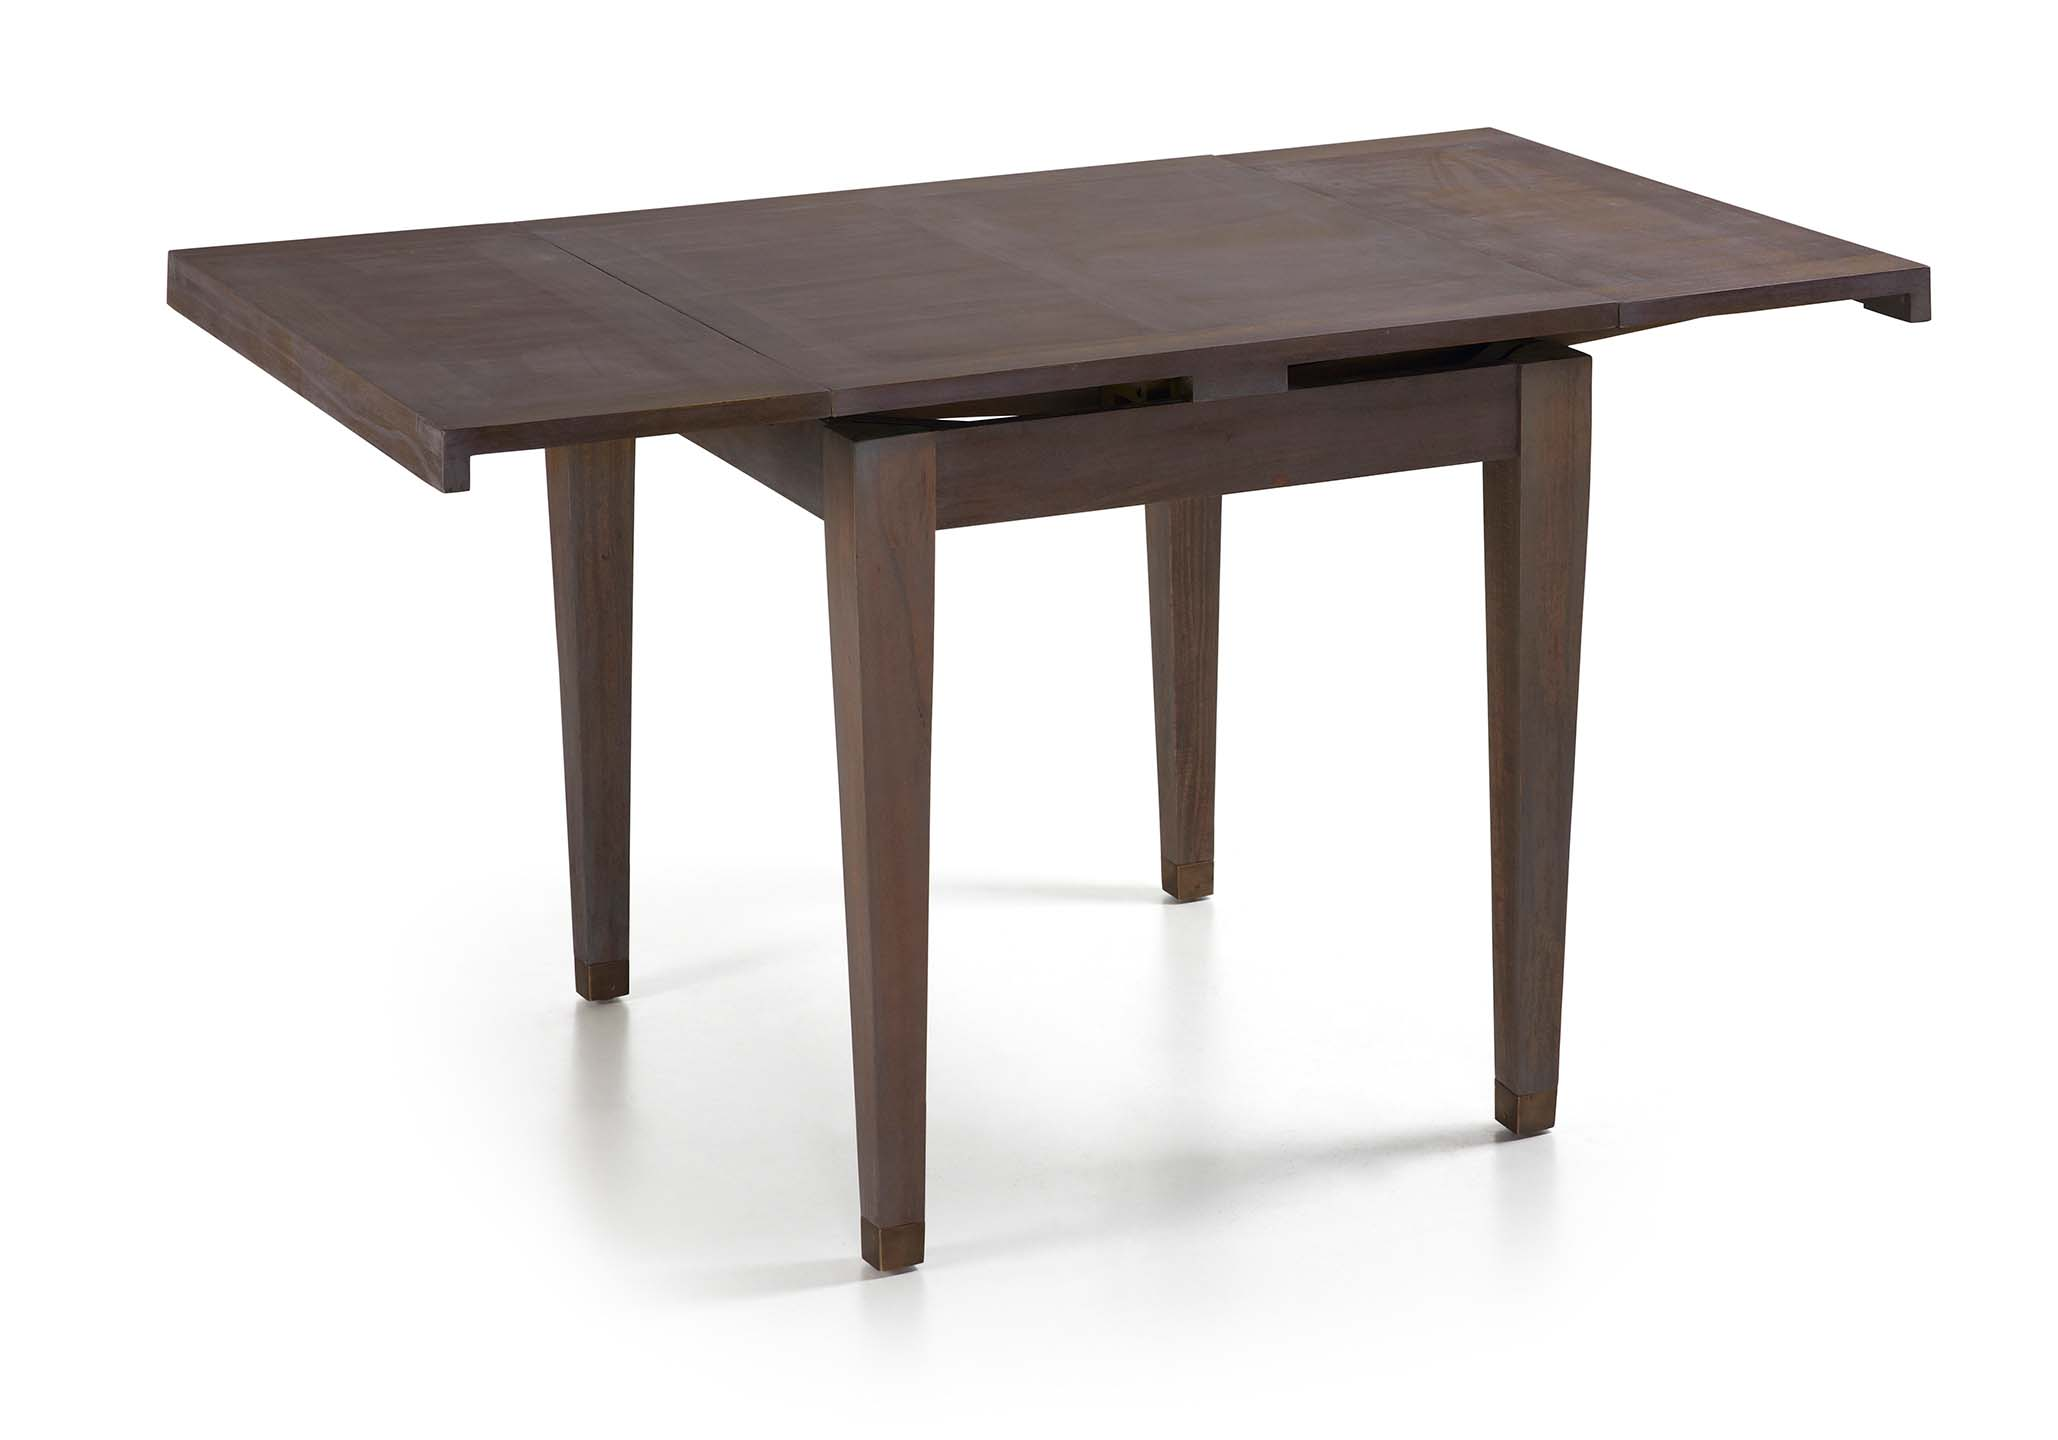 table salle a manger avec rallonge en bois de mindi collection tana image